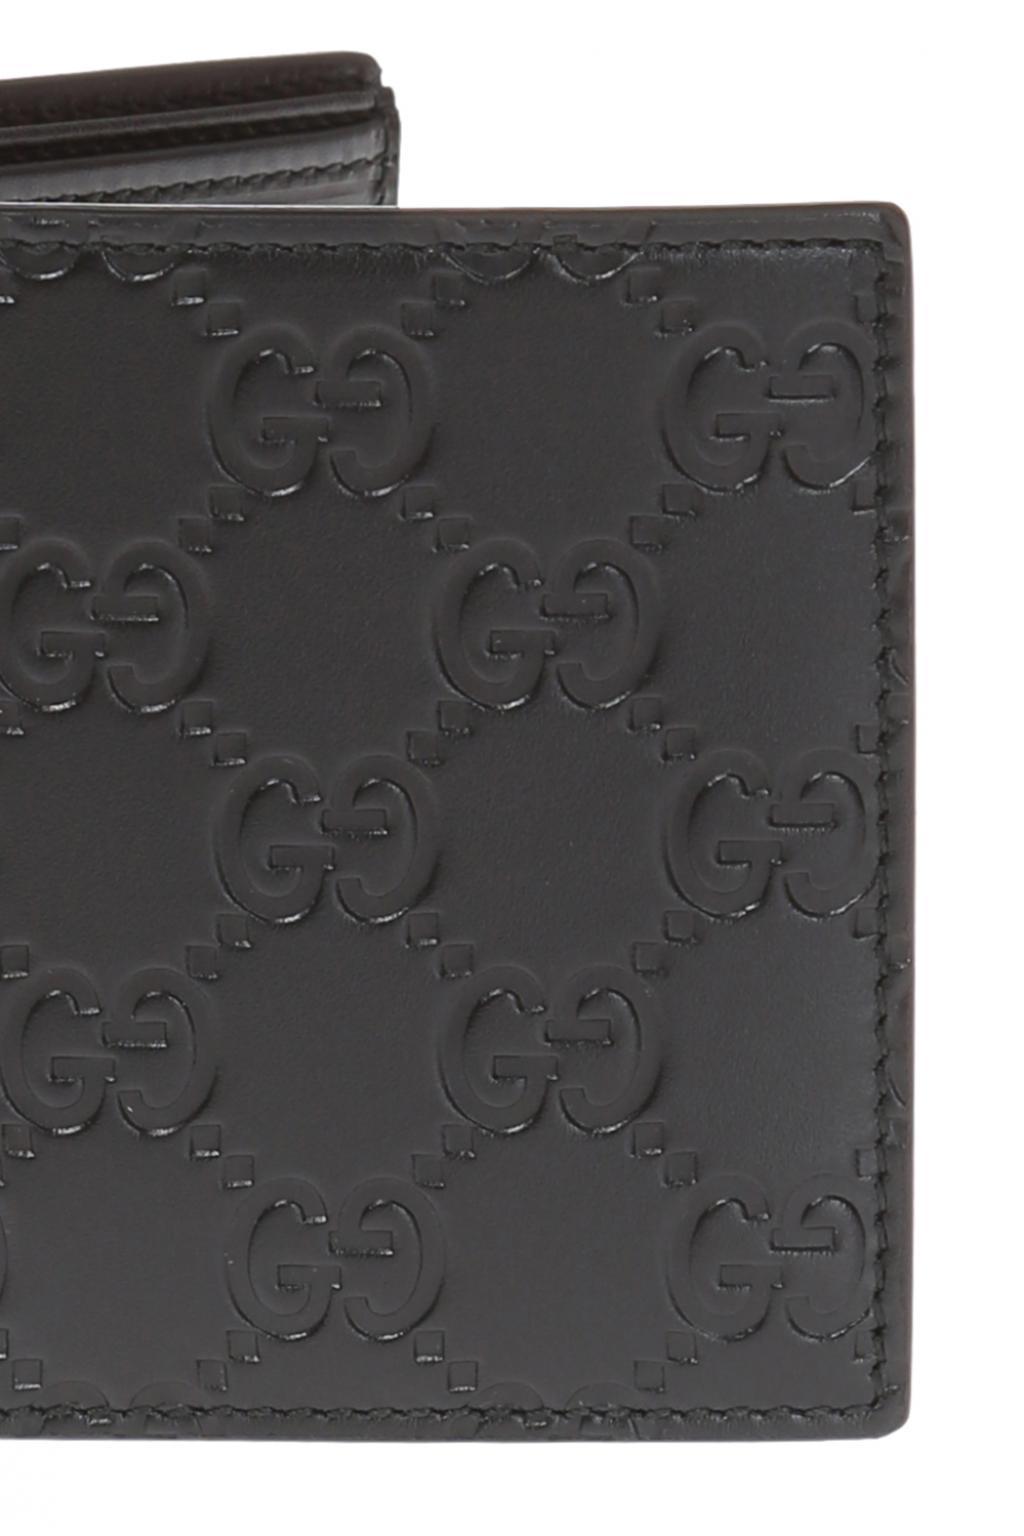 8c6ccd3c303b Gucci - Black Leather Bi-fold Wallet for Men - Lyst. View fullscreen